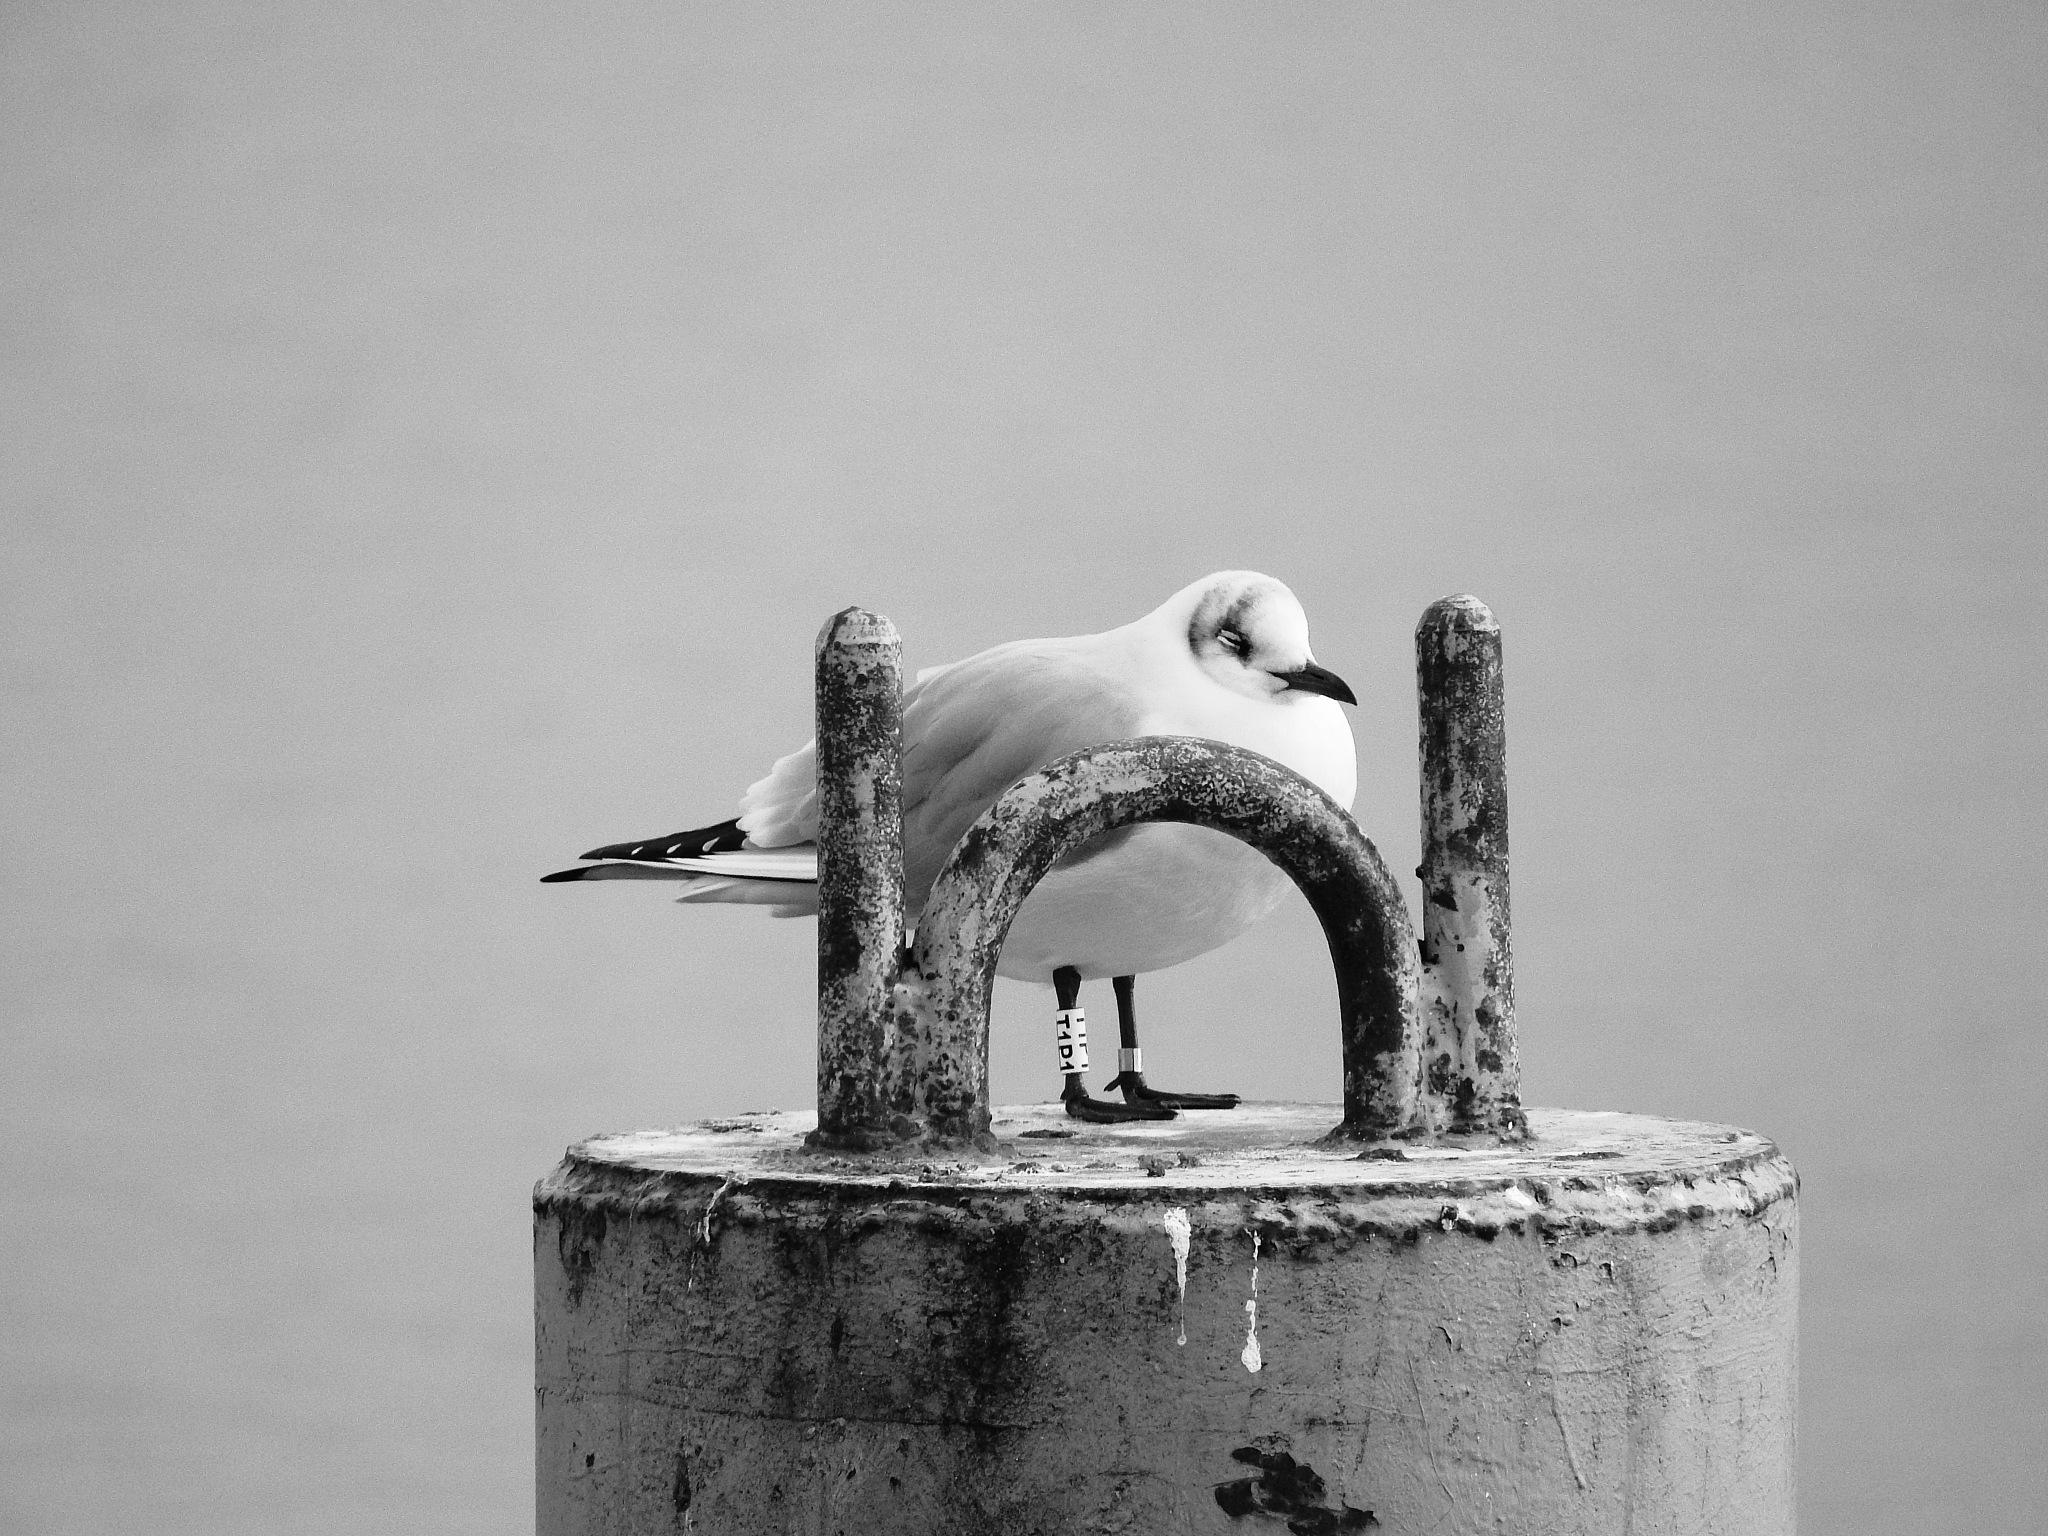 sleepy seagull  by kot_pachinko